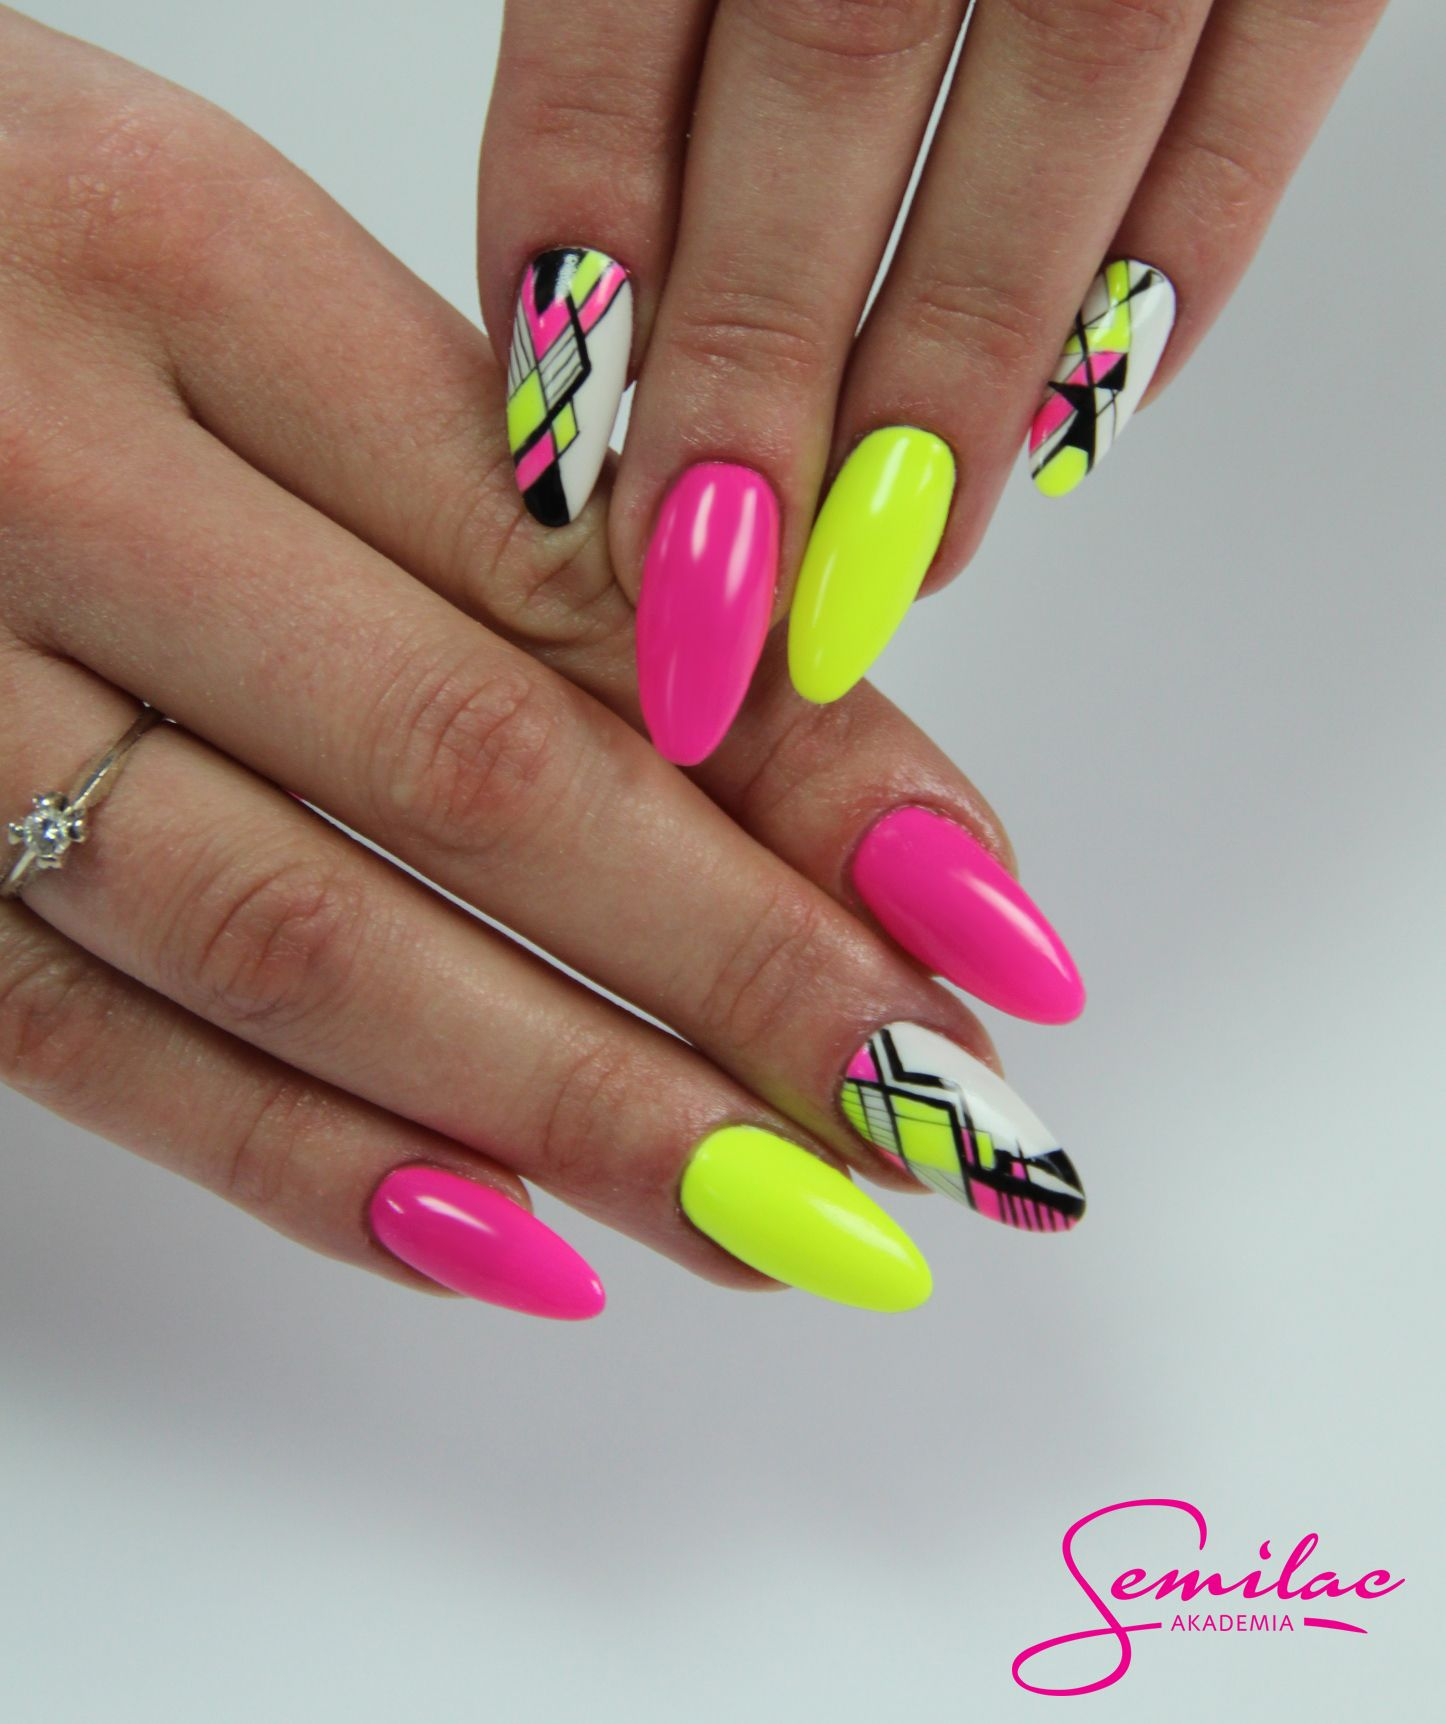 Neonnails Summer Longnails Artnails Nails Napady Na Nehty Uprava Nehtu Nehty